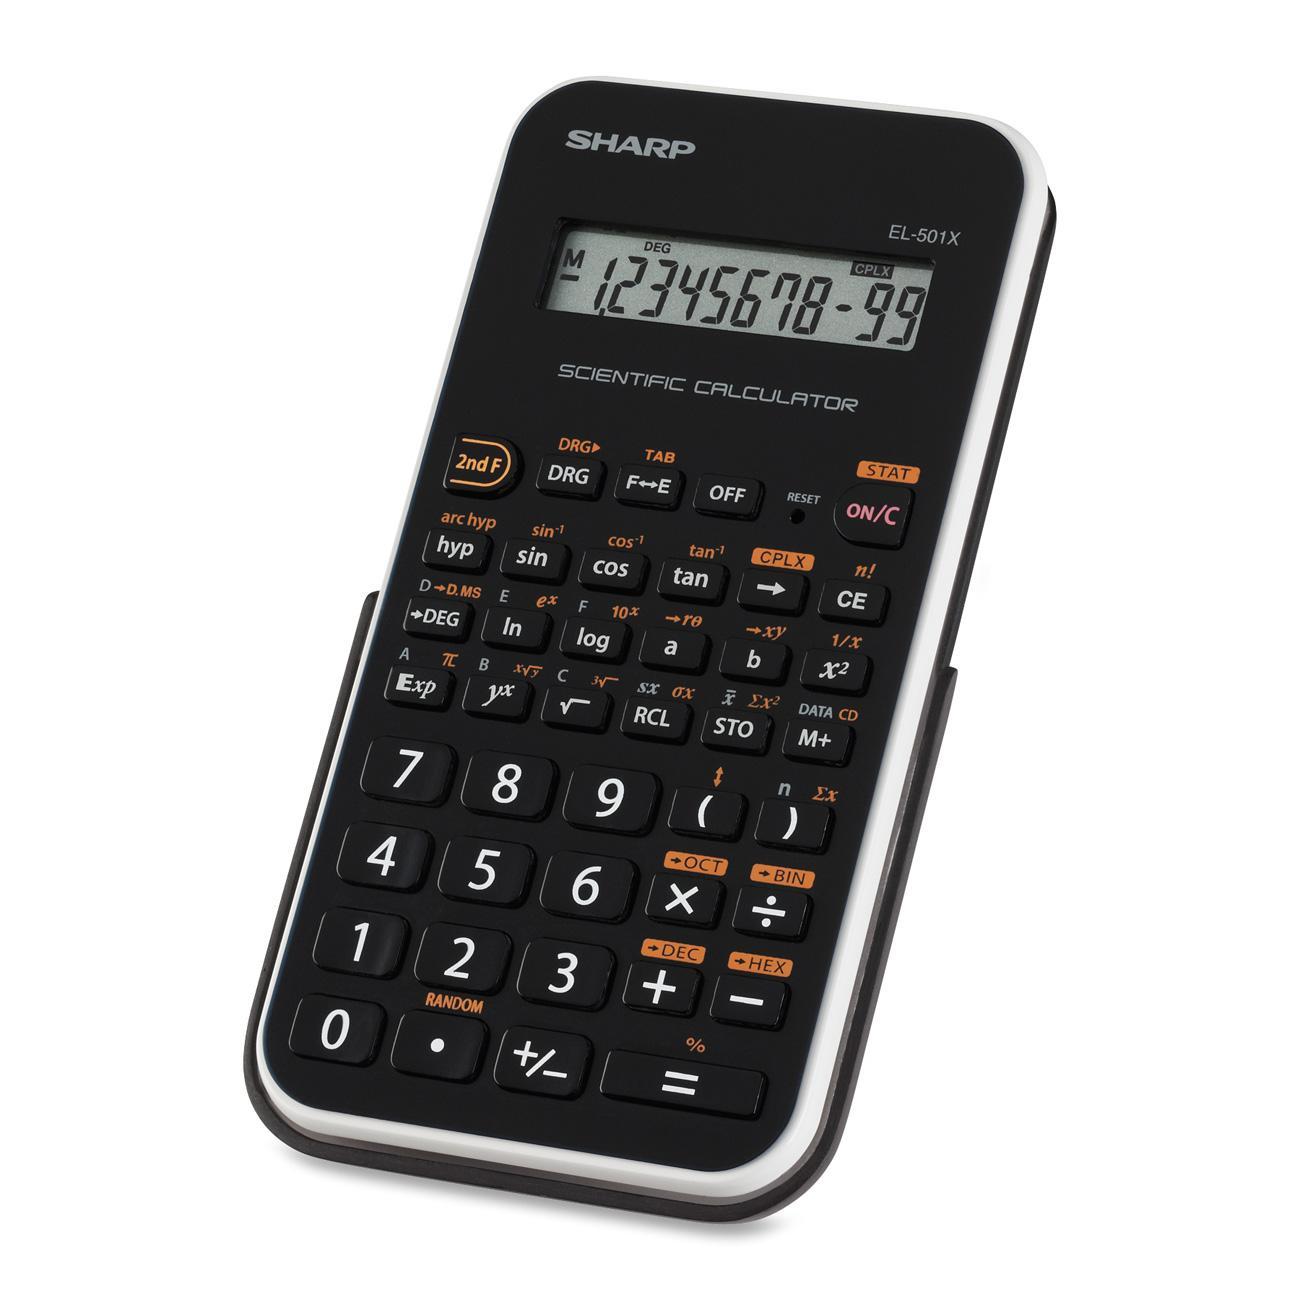 Sharp EL-501XBWH Scientific Calculator, Black, White, 1 Each (Quantity)